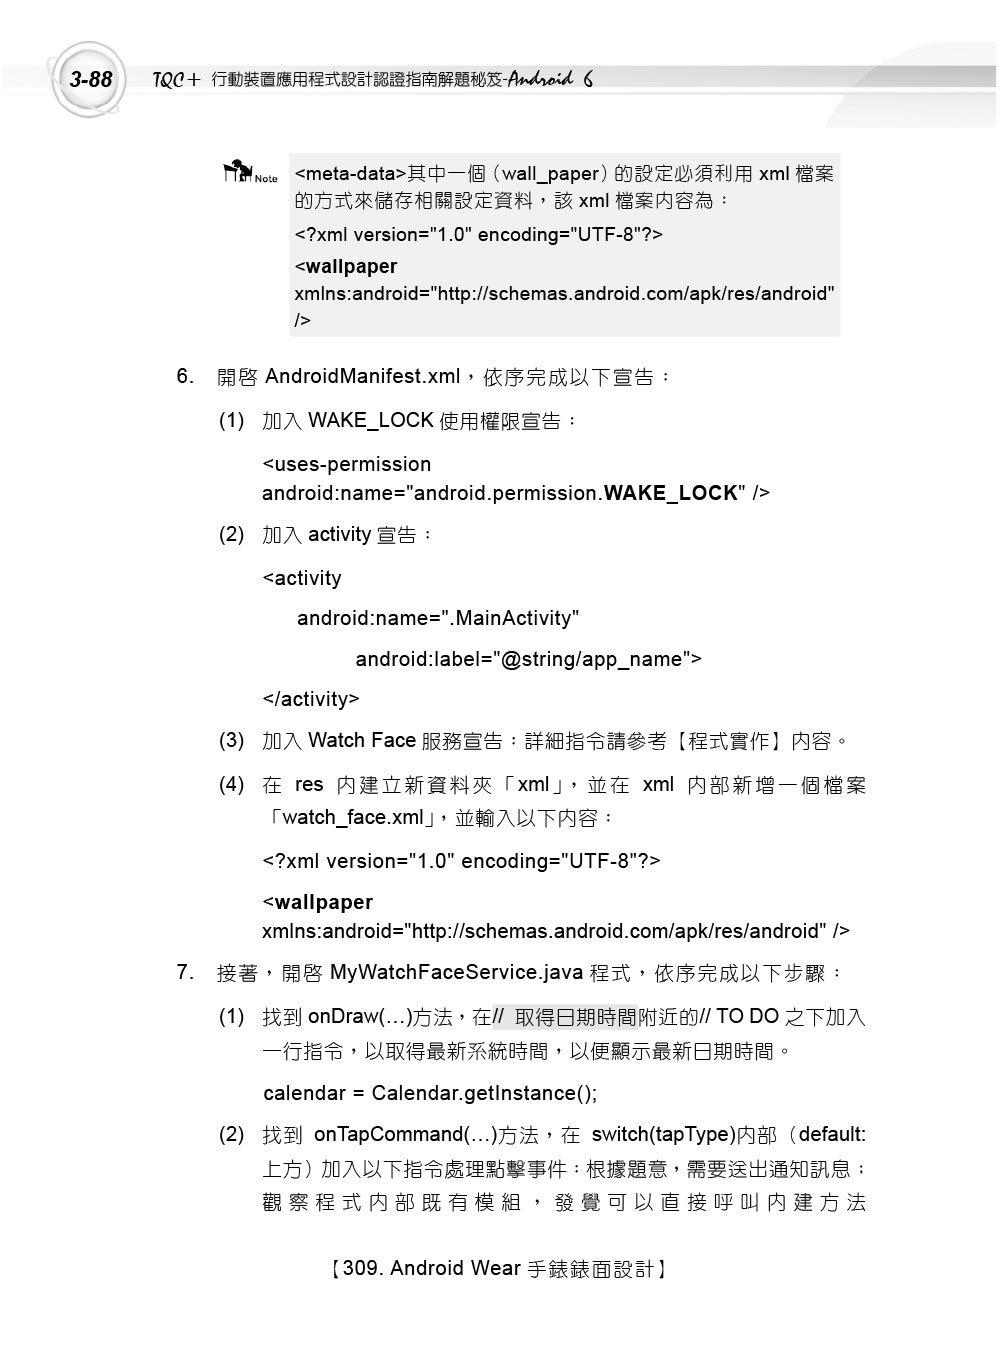 TQC+ 行動裝置應用程式設計認證指南解題秘笈 -- Android 6-preview-17